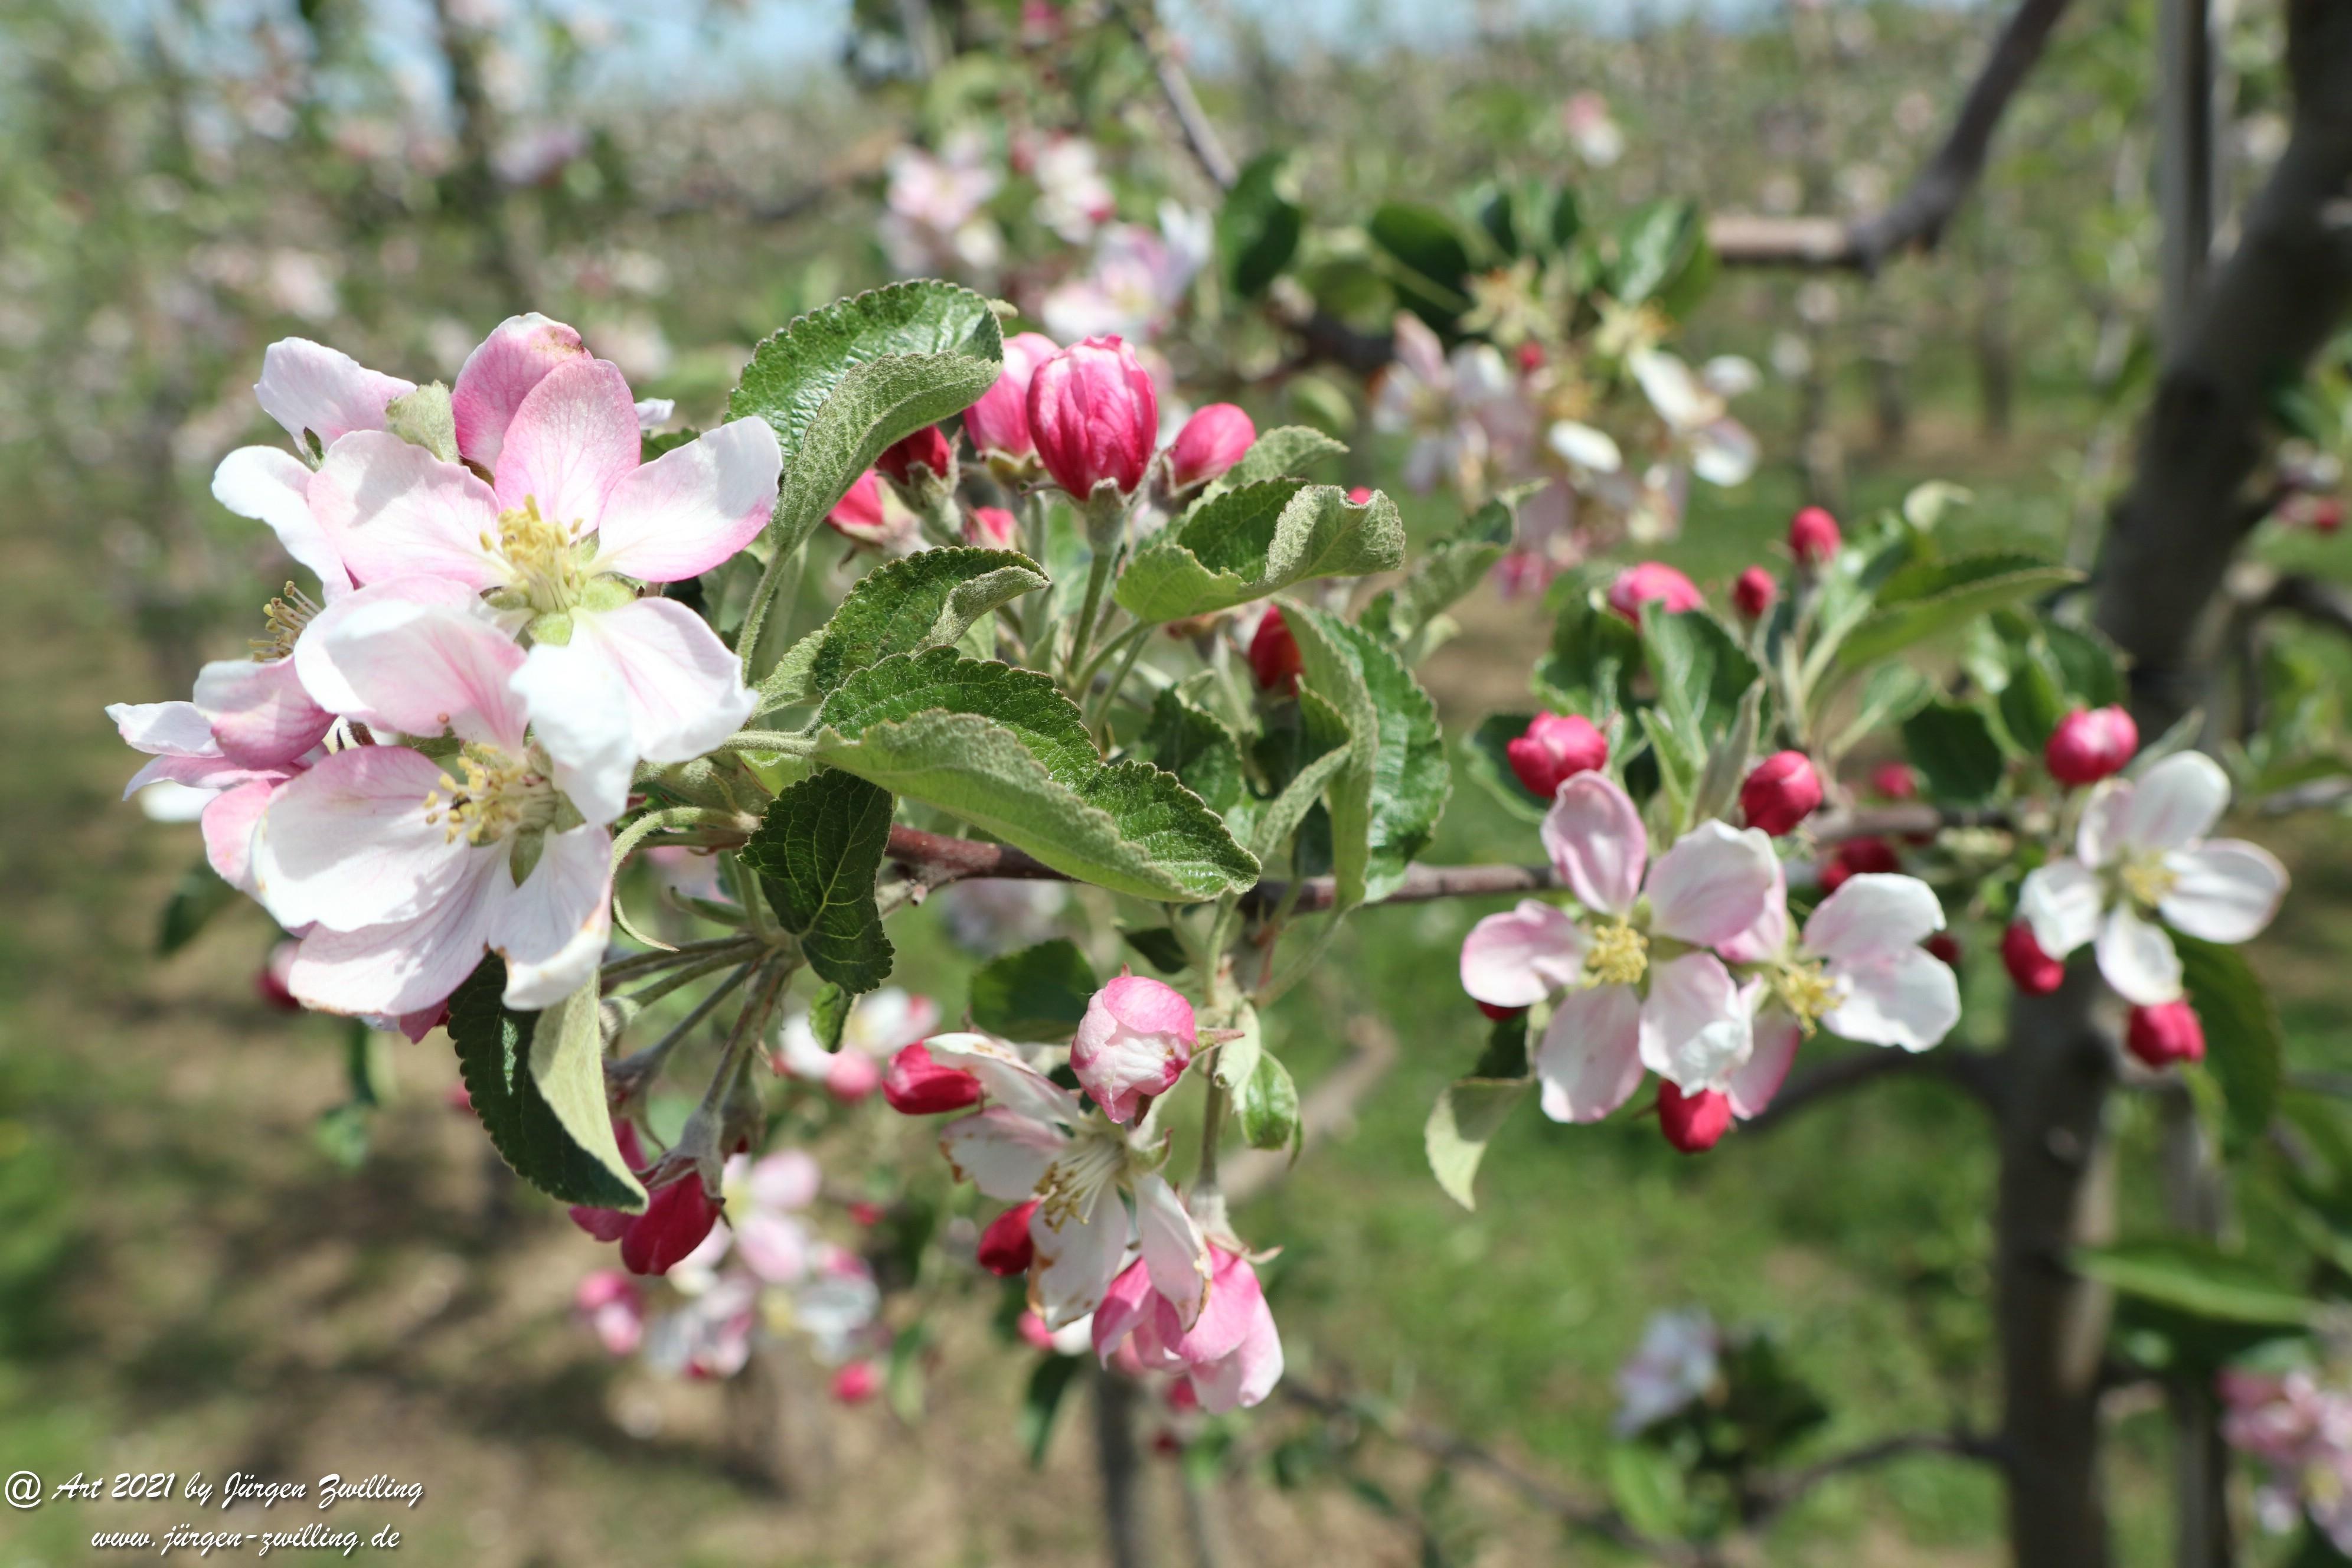 Apfelbaumblüte 7